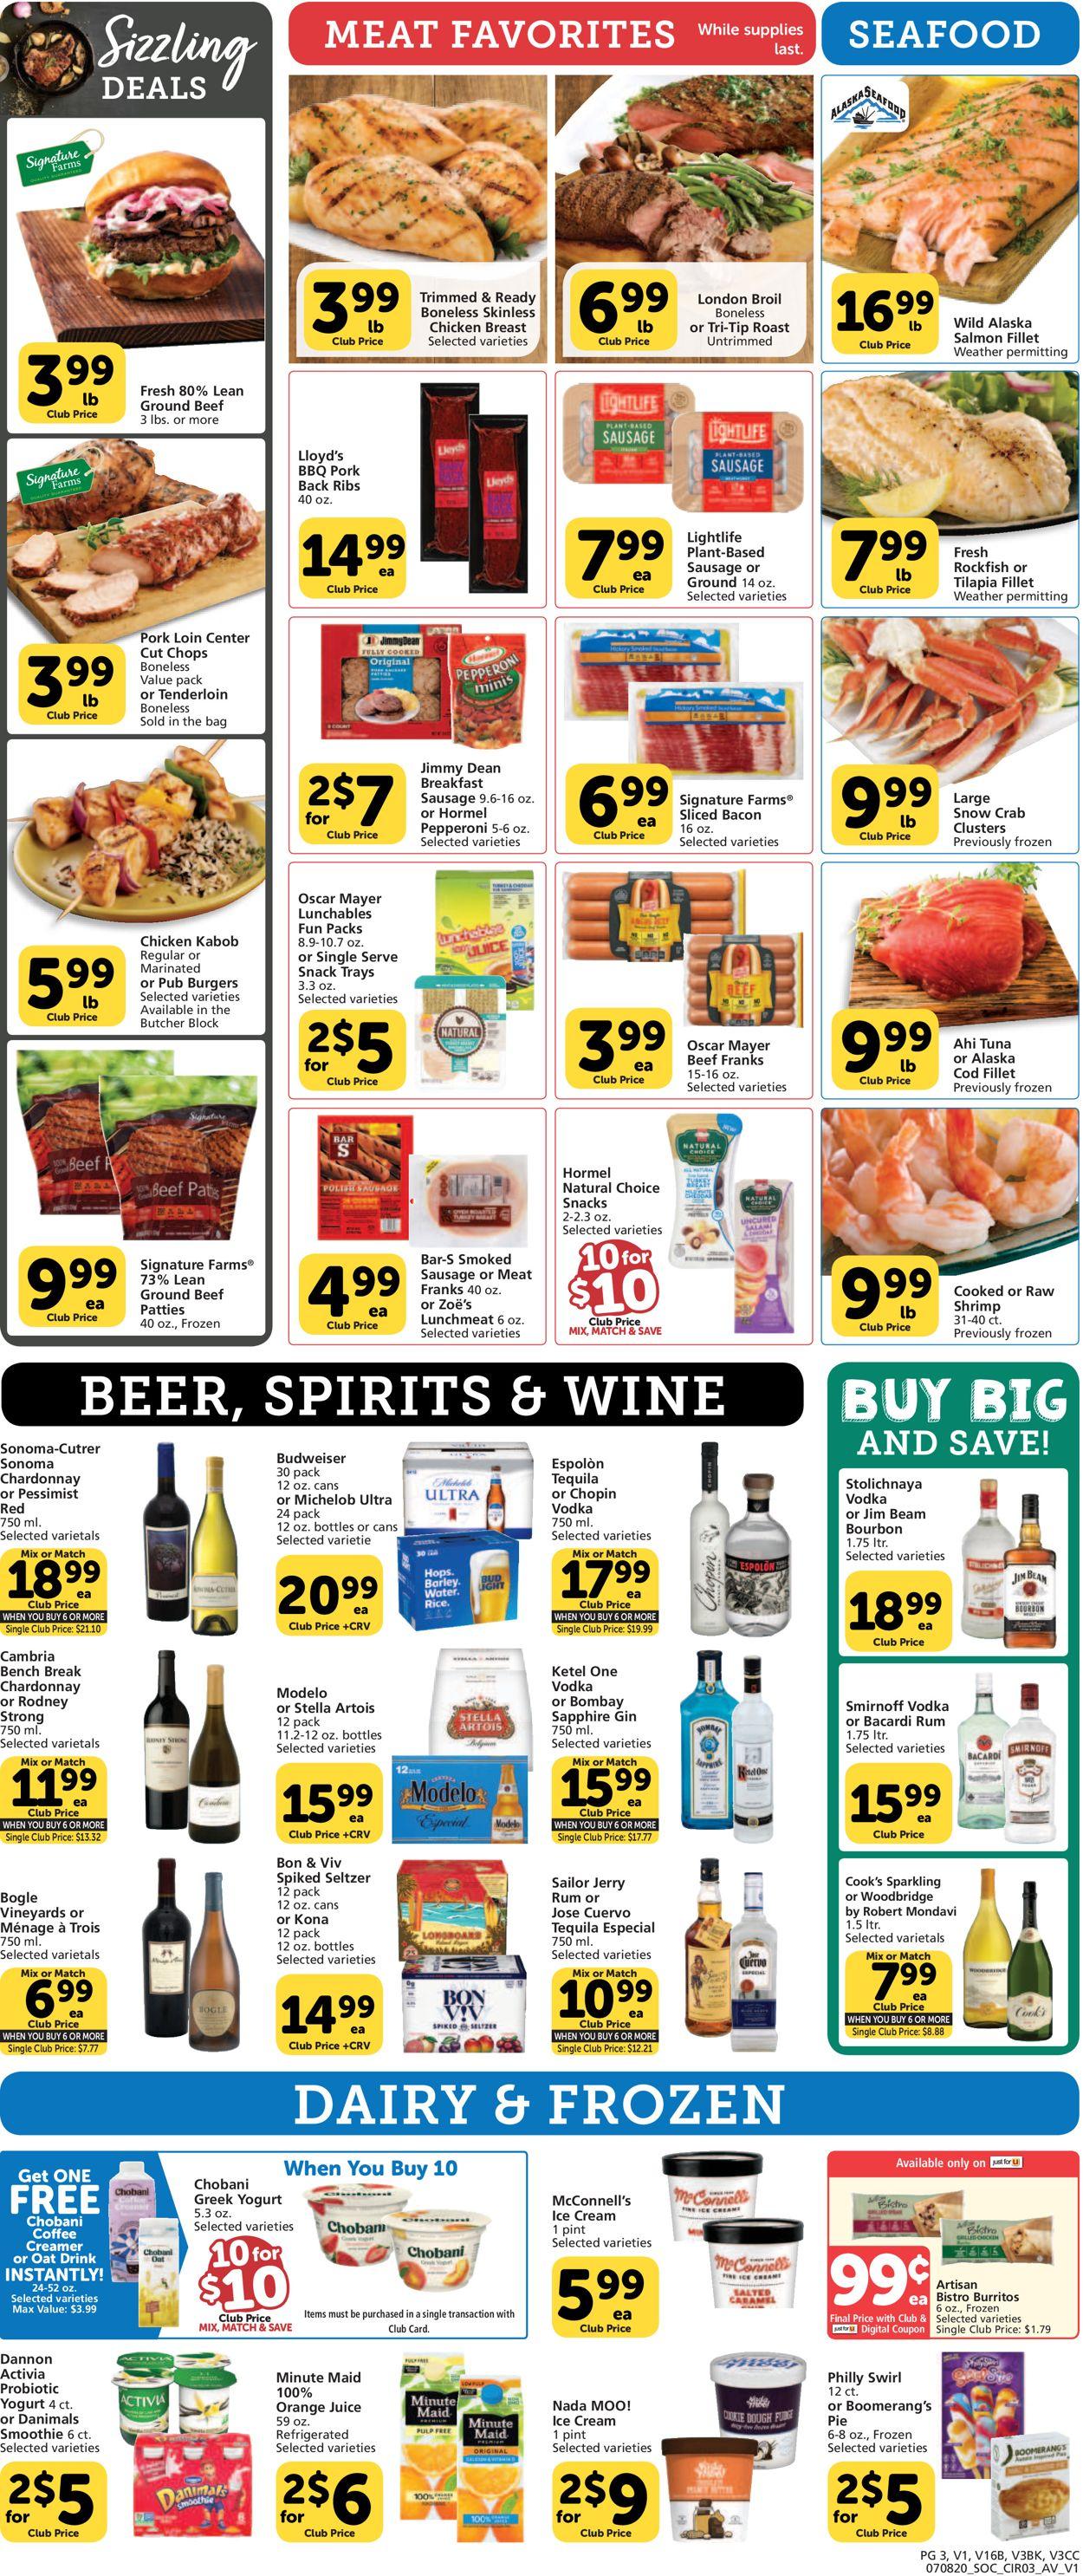 Vons Weekly Ad Circular - valid 07/08-07/14/2020 (Page 3)